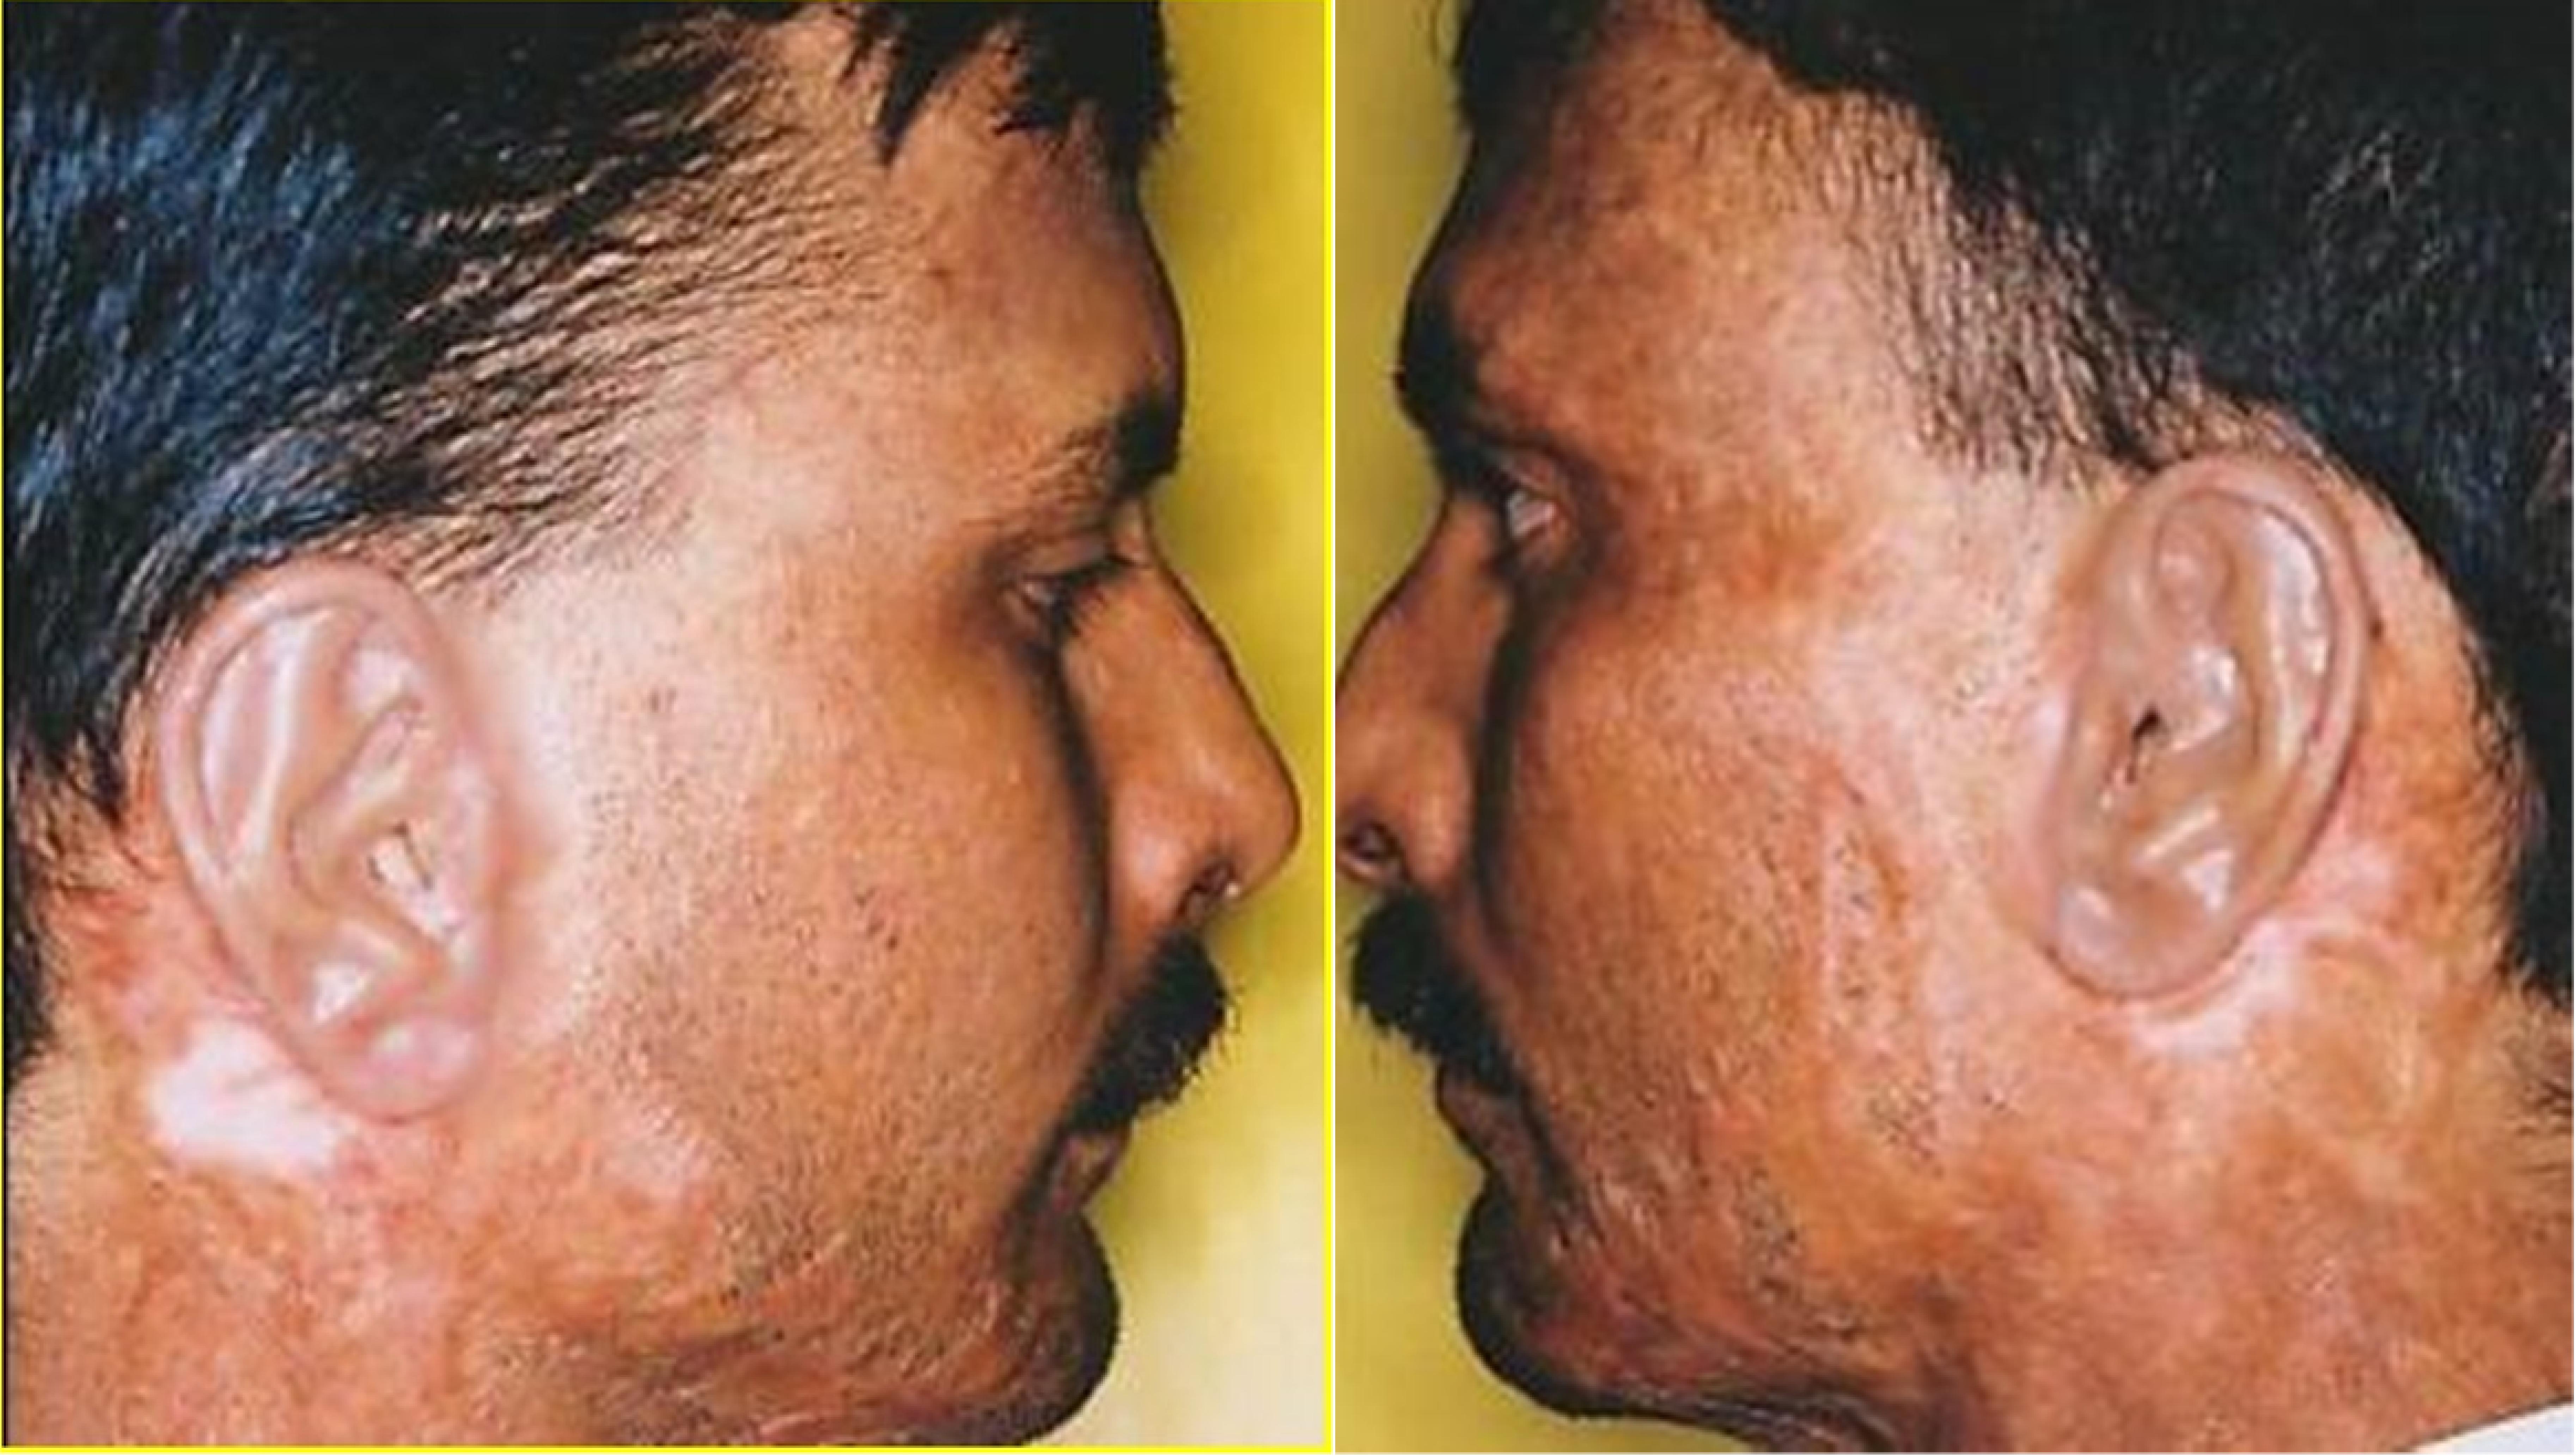 Role of Implants in Maxillofacial Prosthodontic